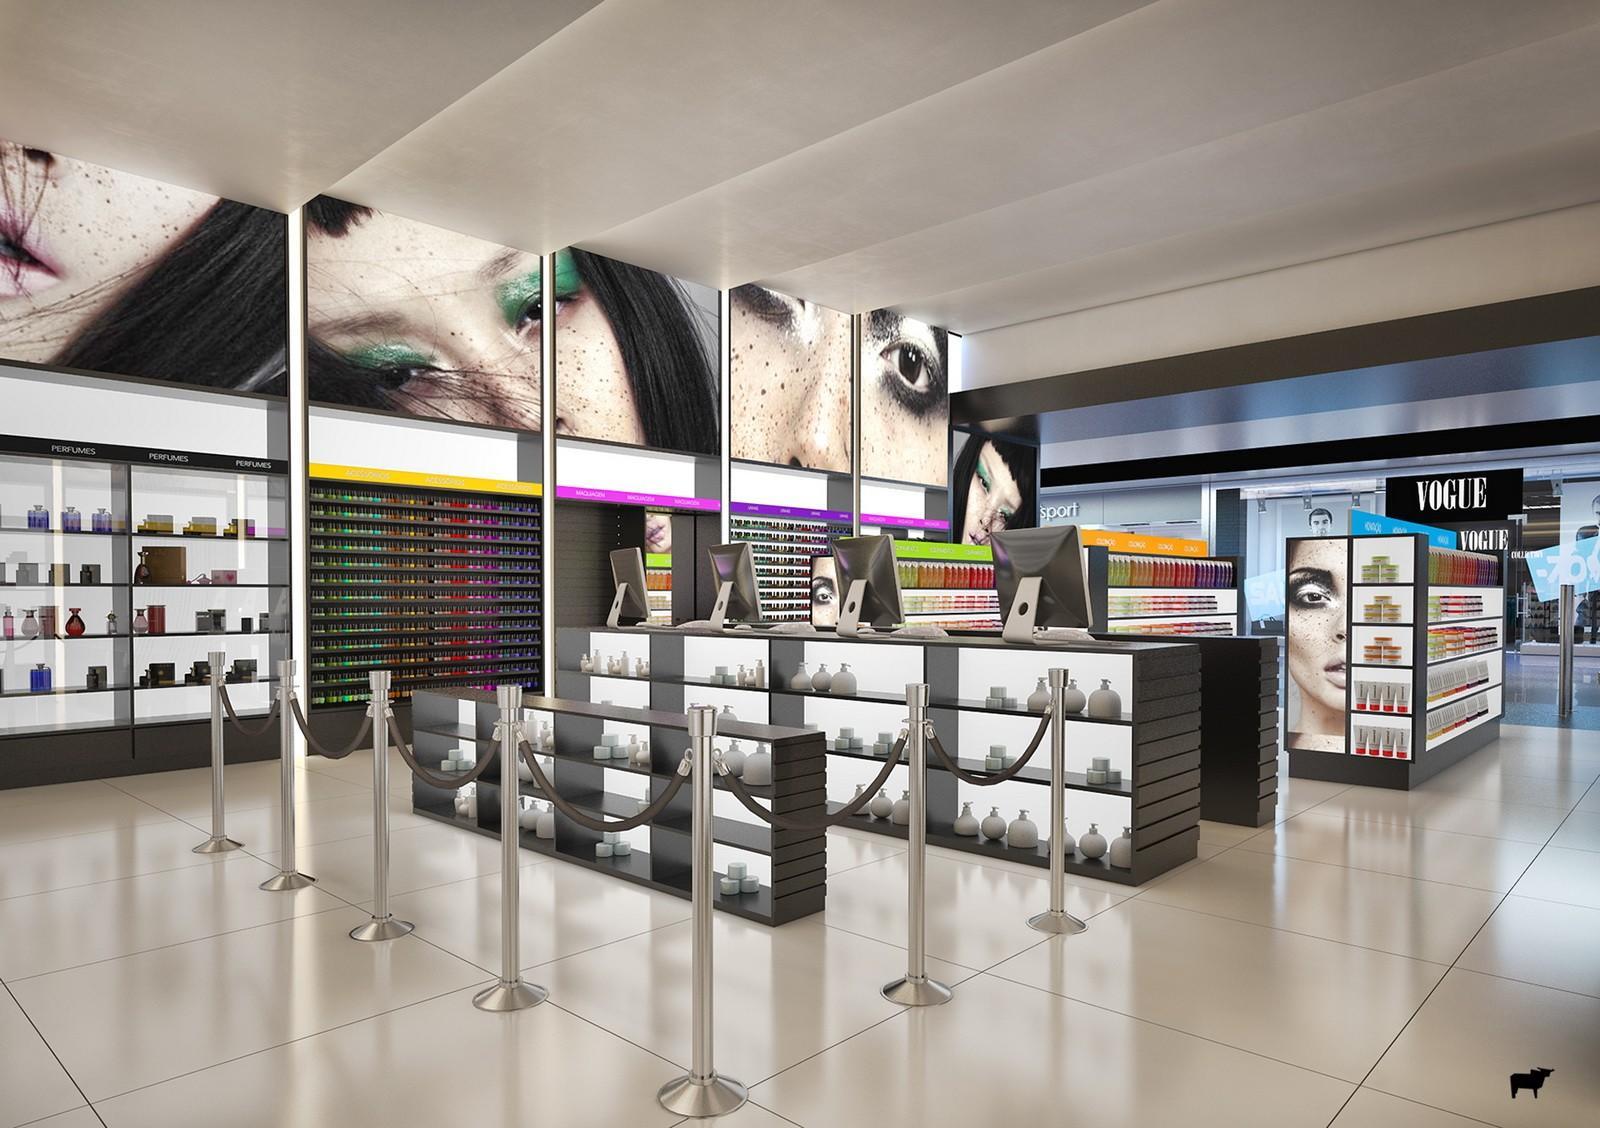 kiosk display cosmetic shop showroom OUYEE Brand